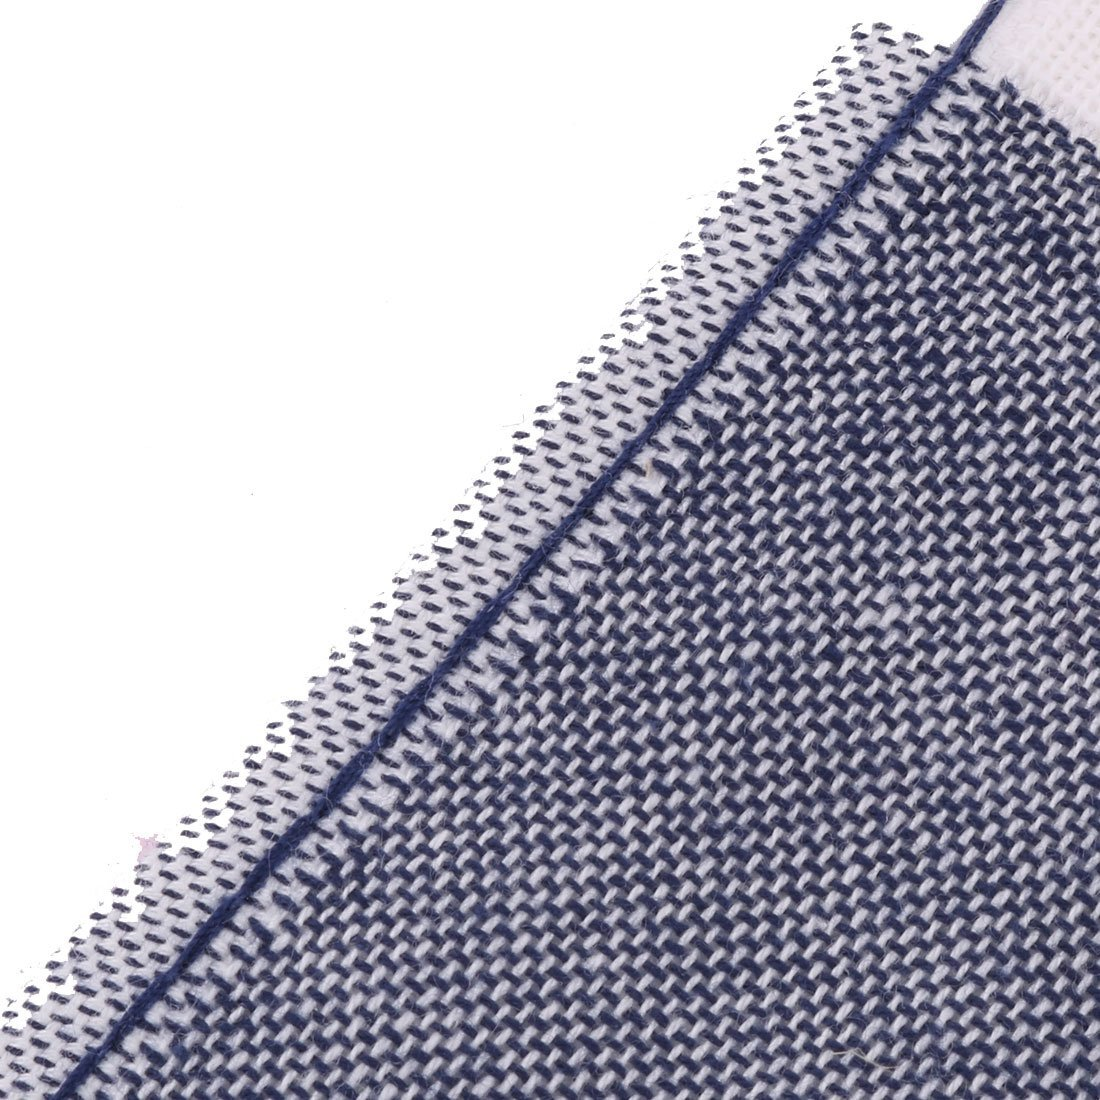 Amazon.com: eDealMax mezclas de algodón a Cuadros Imprimir Familiar Actividades toalla de baño Ducha Falda del Abrigo paño DE 1,4 x 0,7 M Multicolor: Home & ...